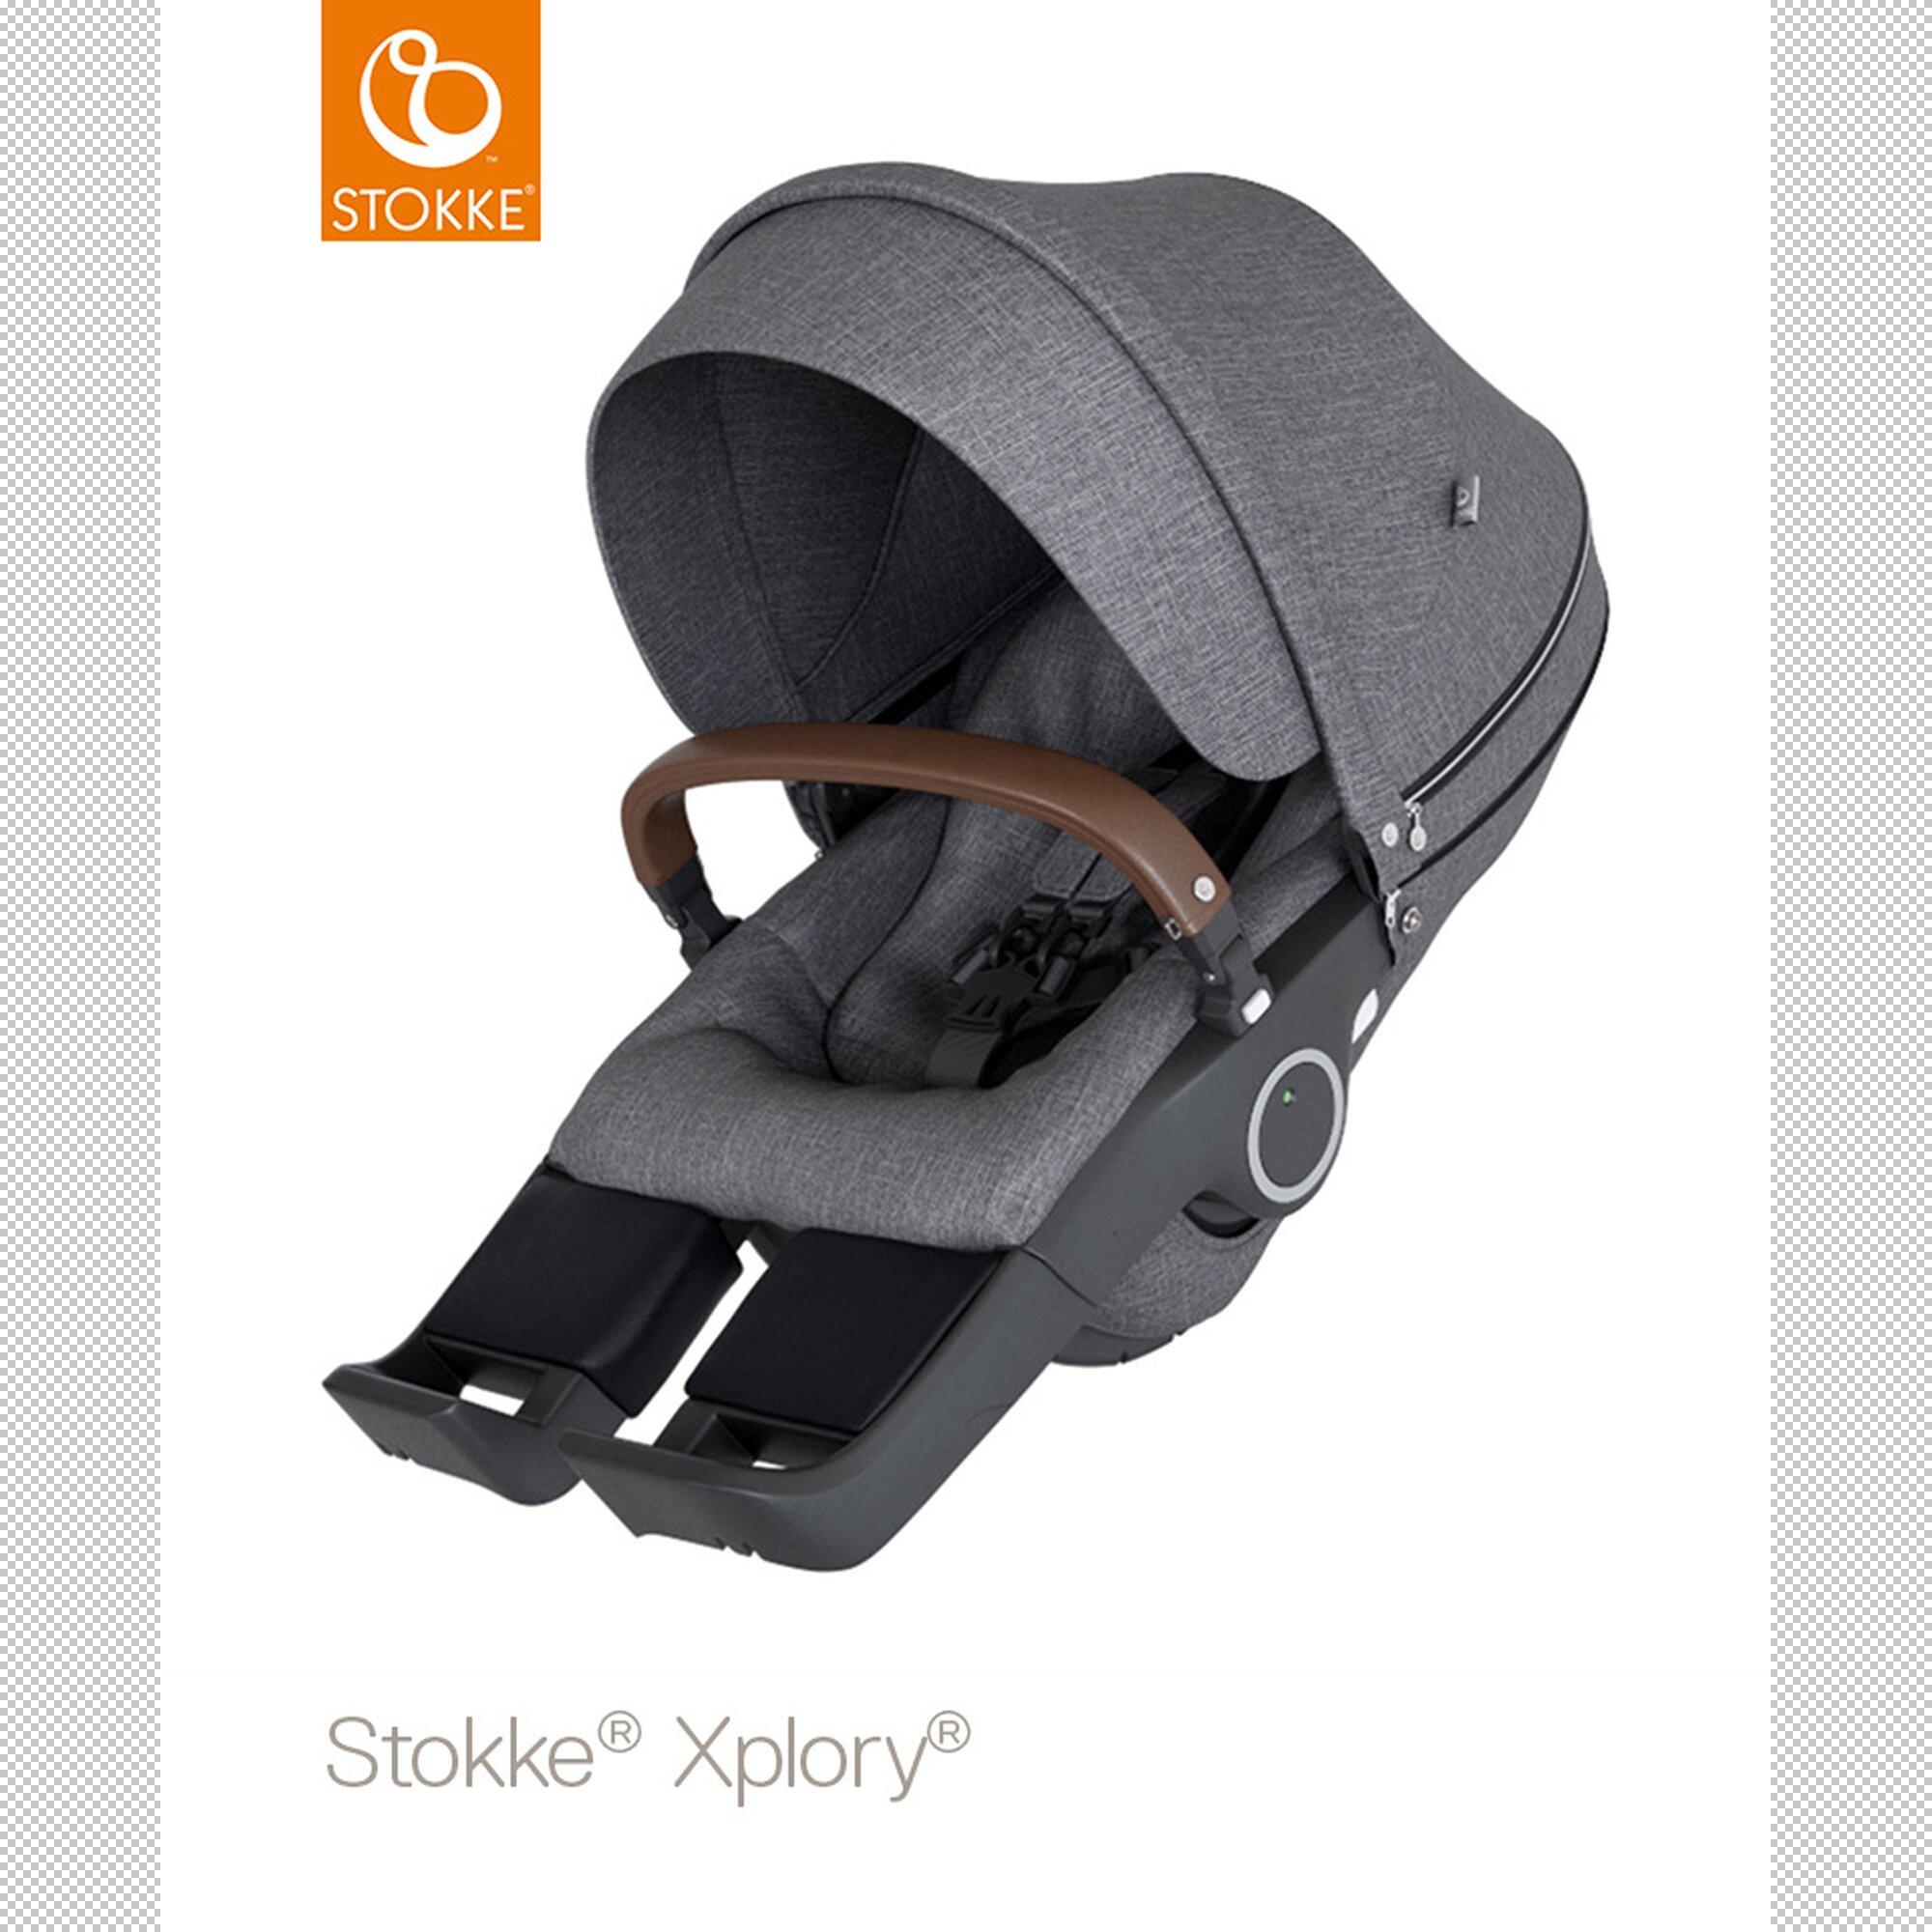 stokke-sitzaufsatz-fur-xplory-v6-design-2018-schwarz